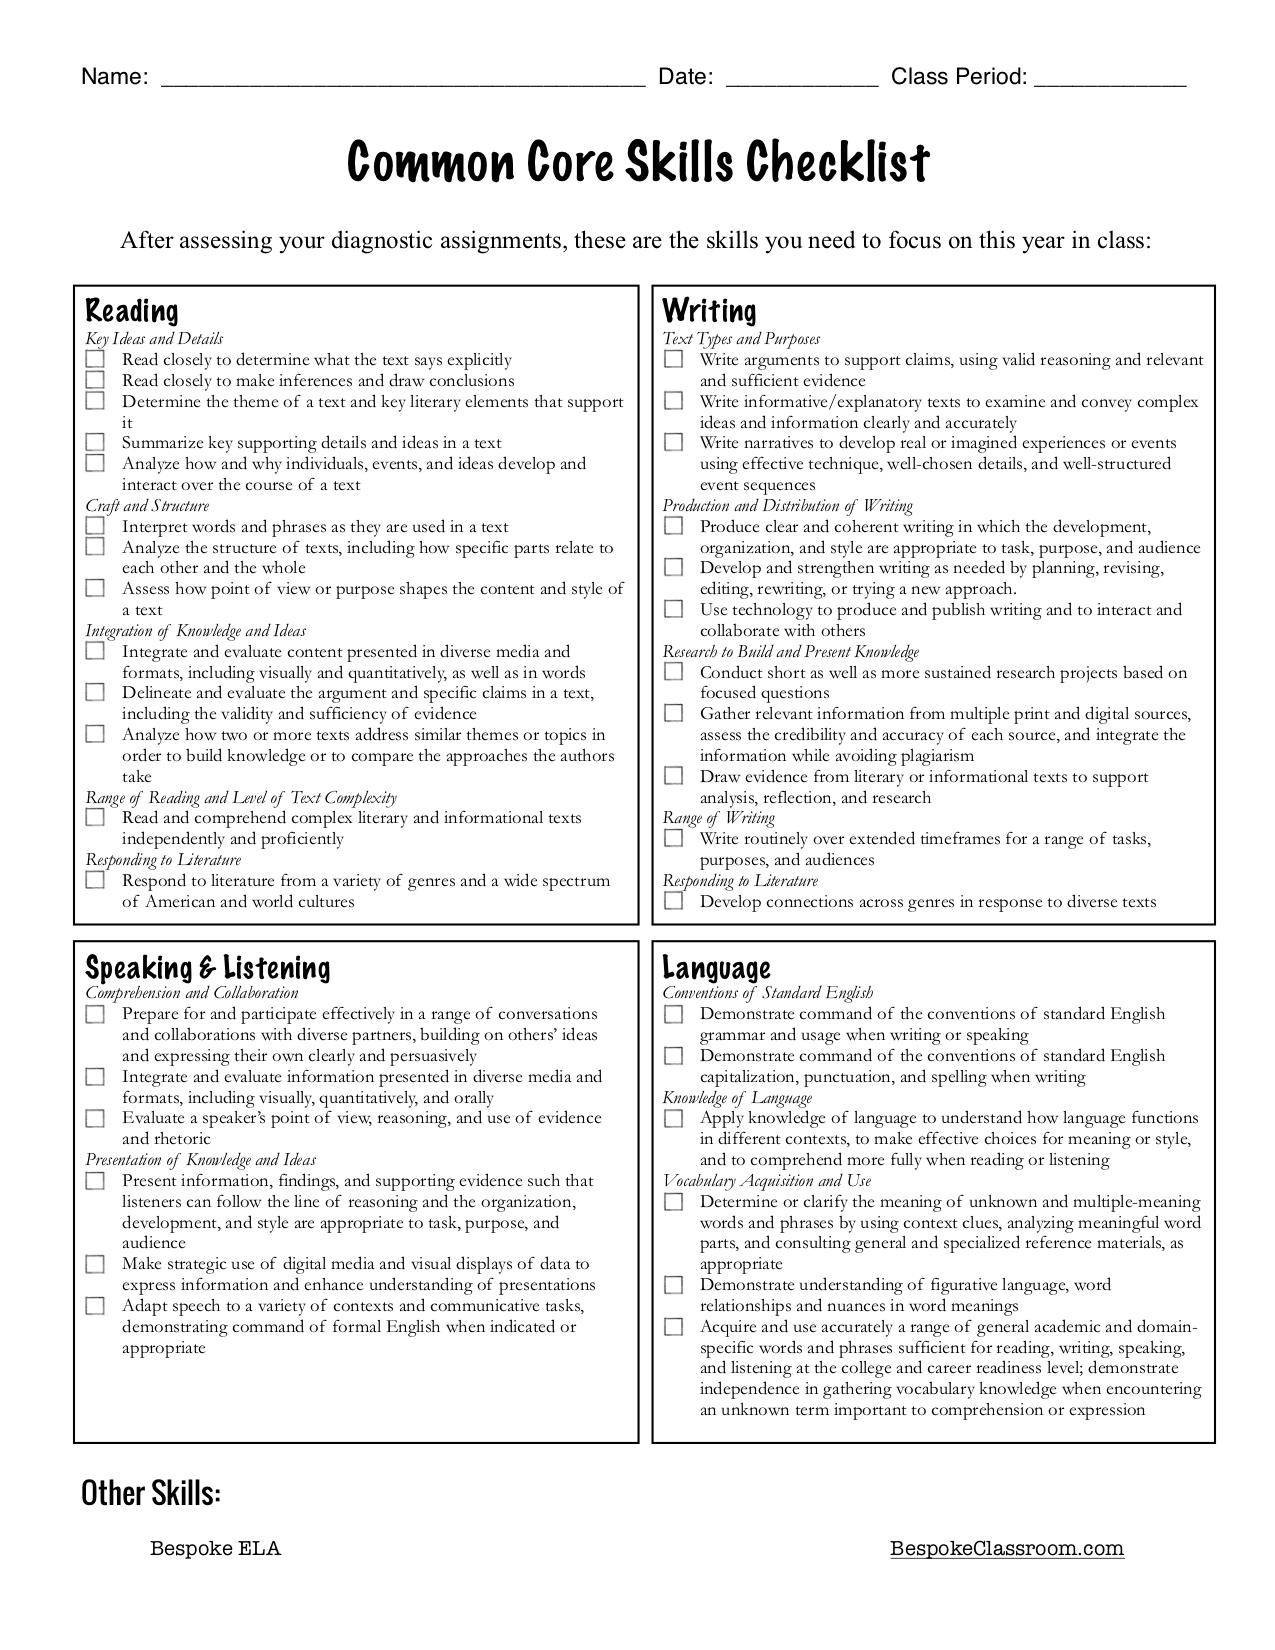 Diagnostic Assignment Bundle for High School ELA by Bespoke ELA checklist.jpg